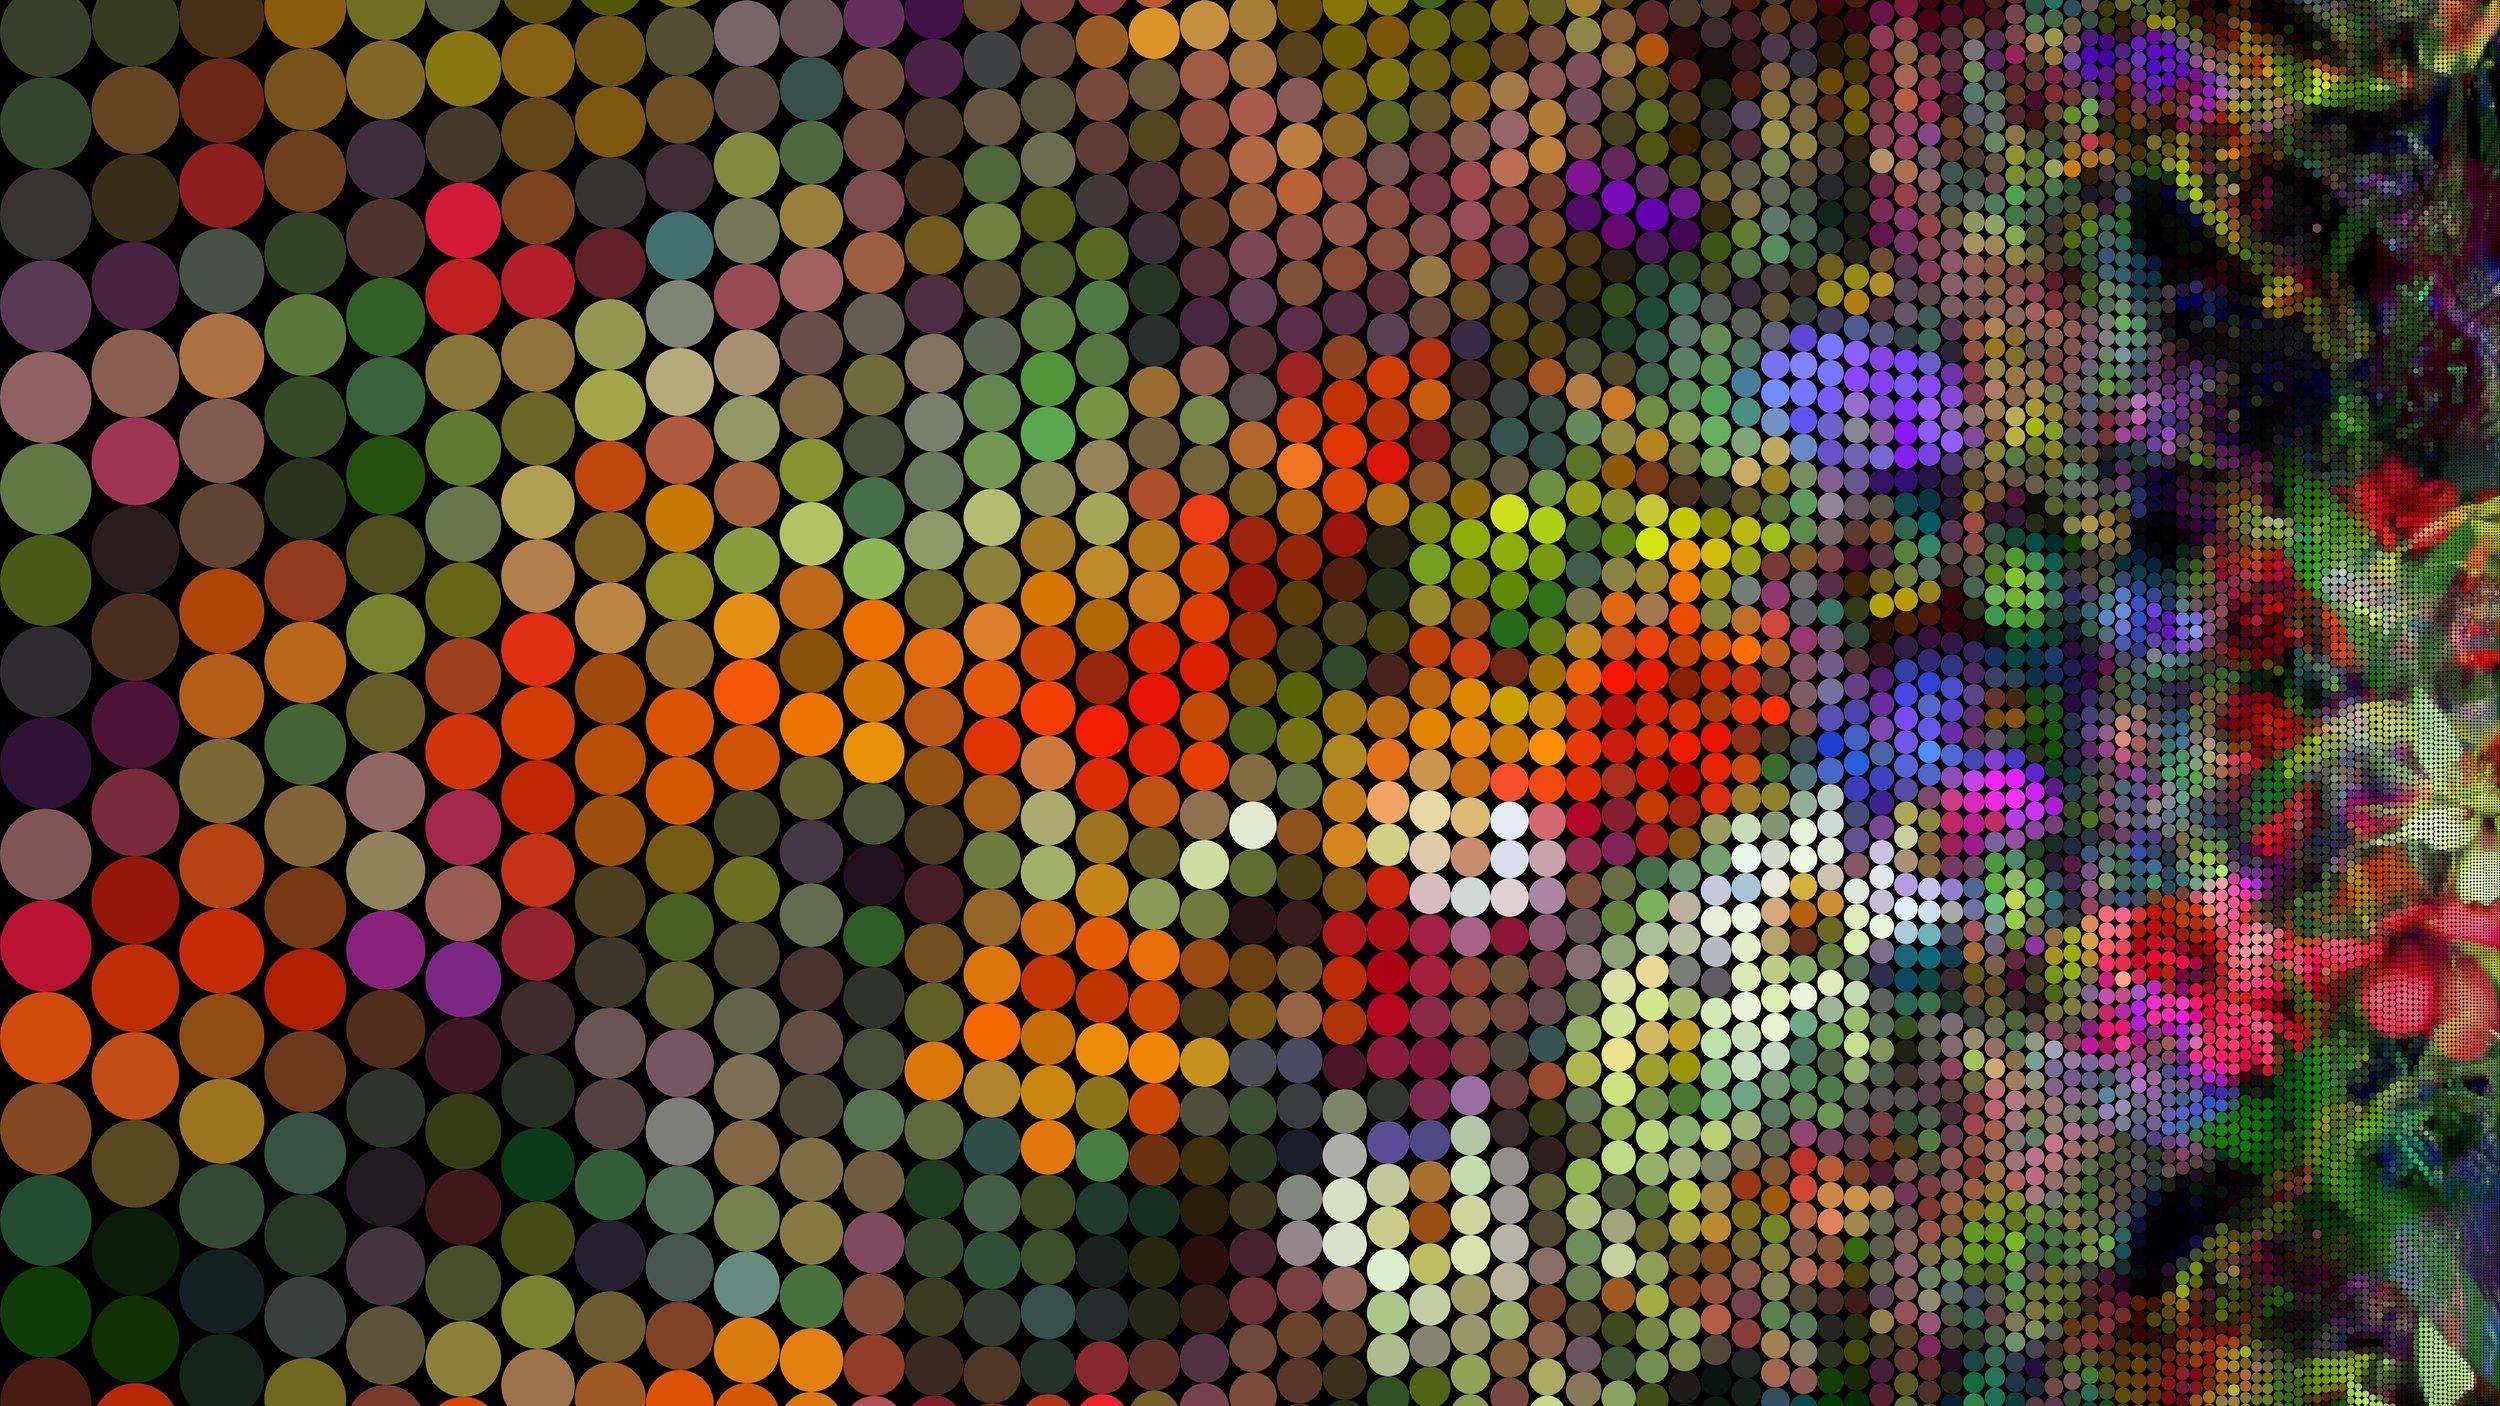 Imagen por Dmitri Posudin para Pexels